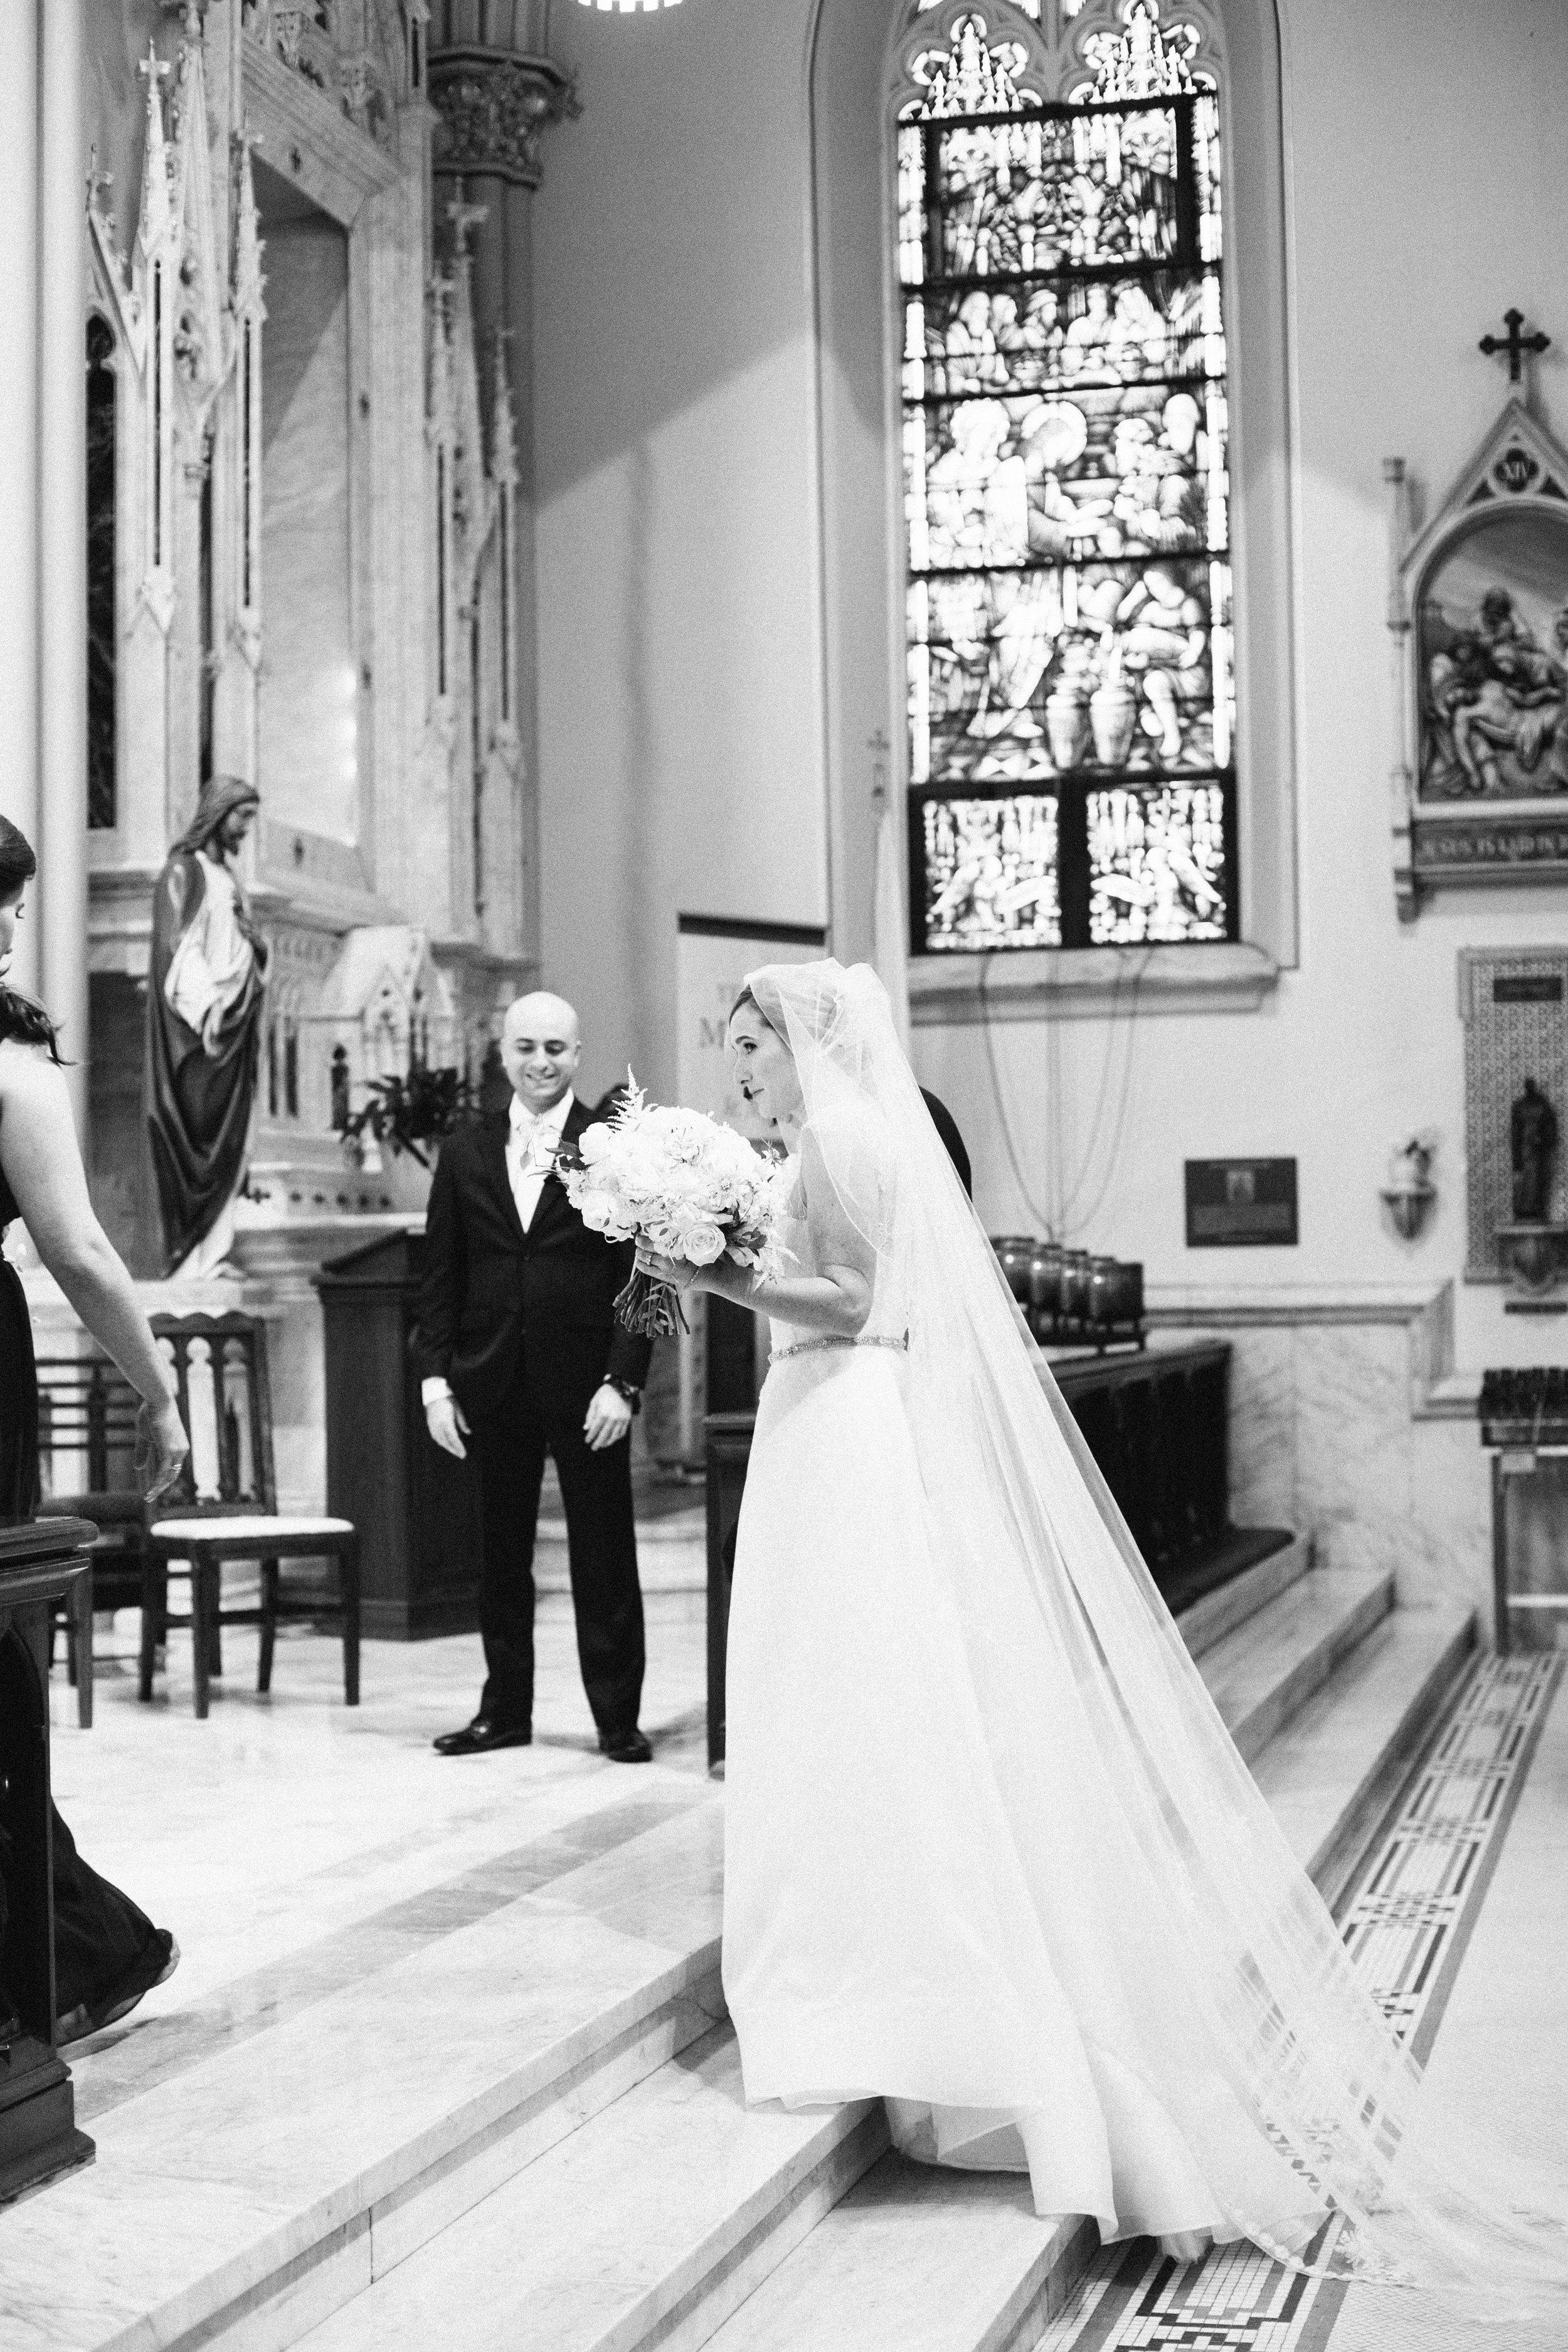 019-MA17_St-Marys-Catholic-Church-Annapolis-Wedding.jpg